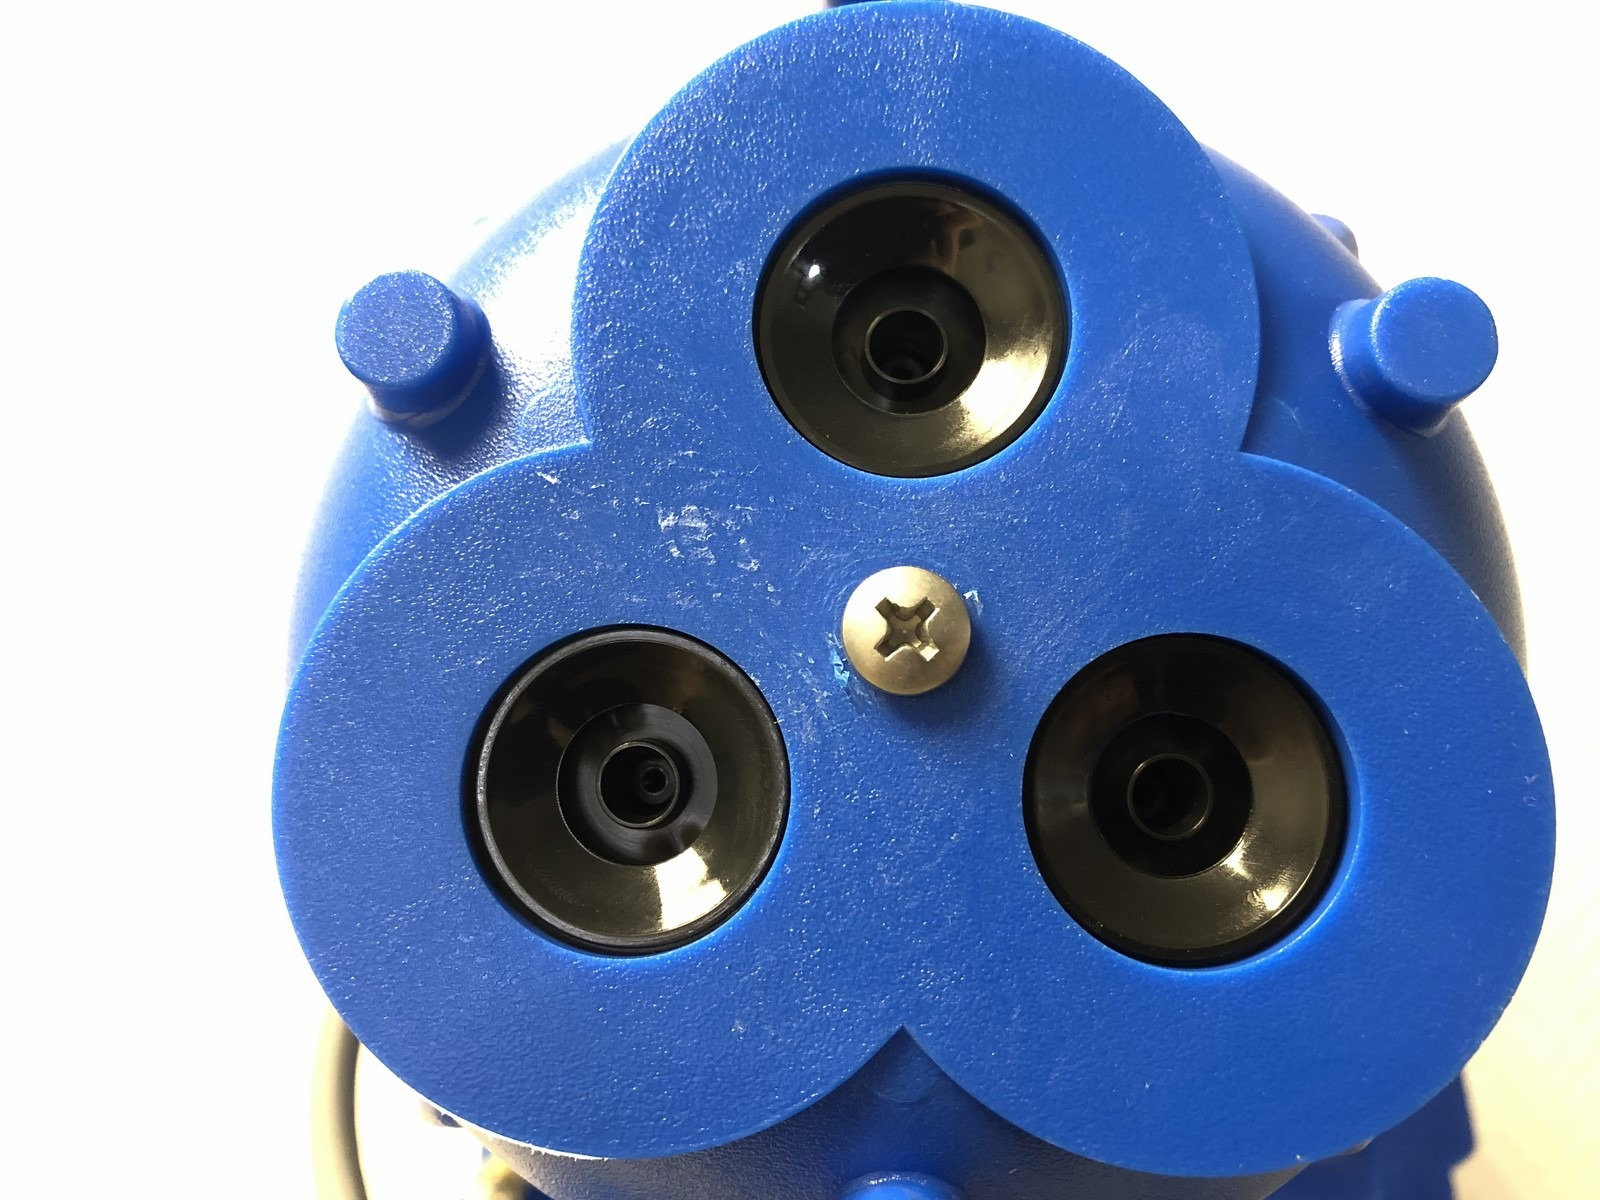 tete zoom canon de brumisation portatif portable autonome turboram TRD5 Portable